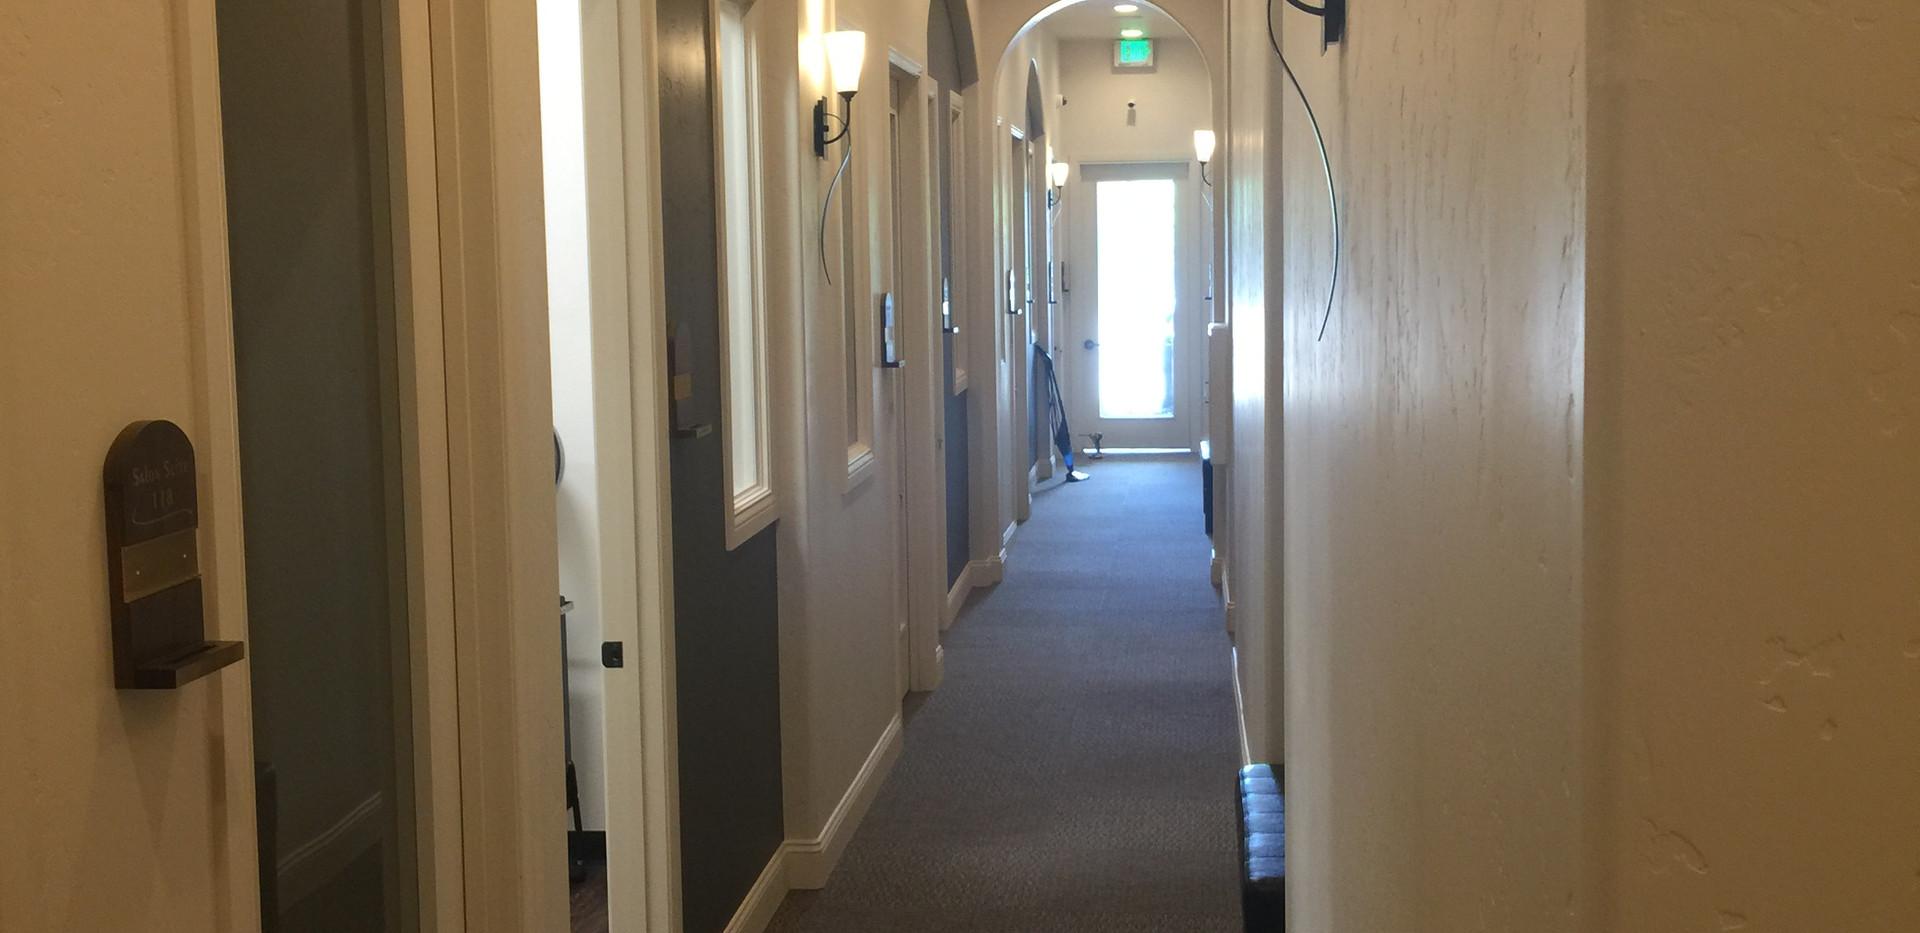 North Hallway for Phenix